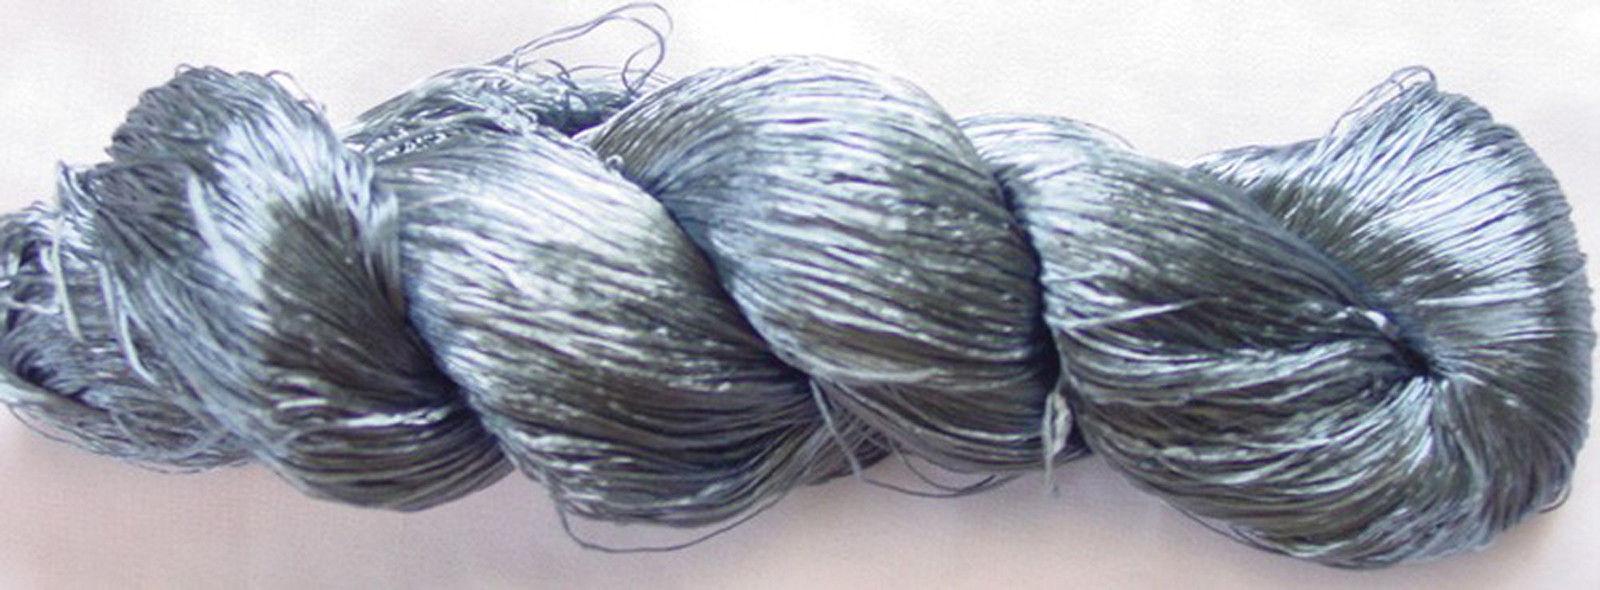 New Silk 1 PLY Skeins Yarn Lace Crochet 115g Woven Thread Knit Work Sari Fabric